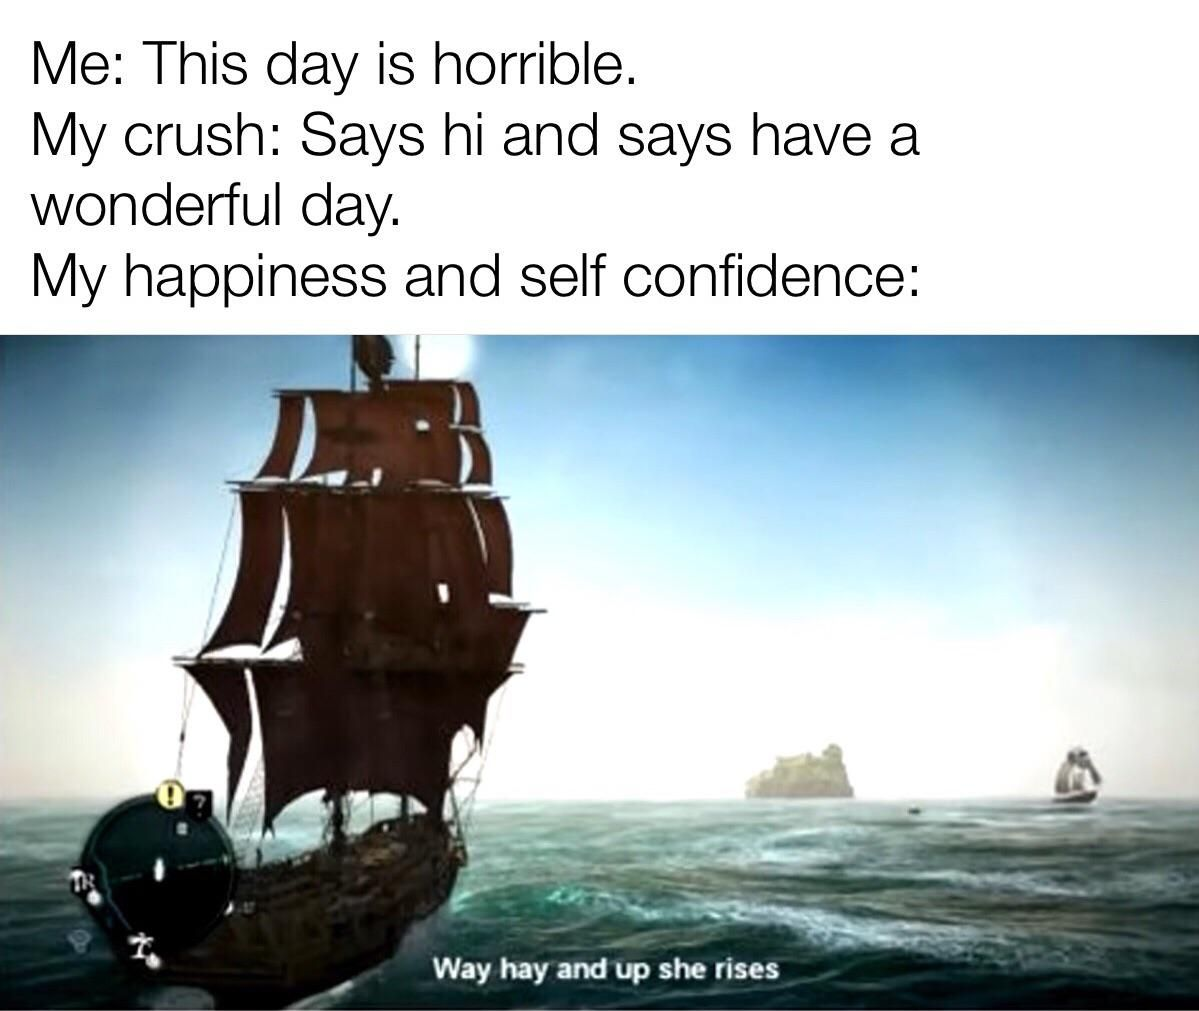 We Need More Assassins Creed Memes